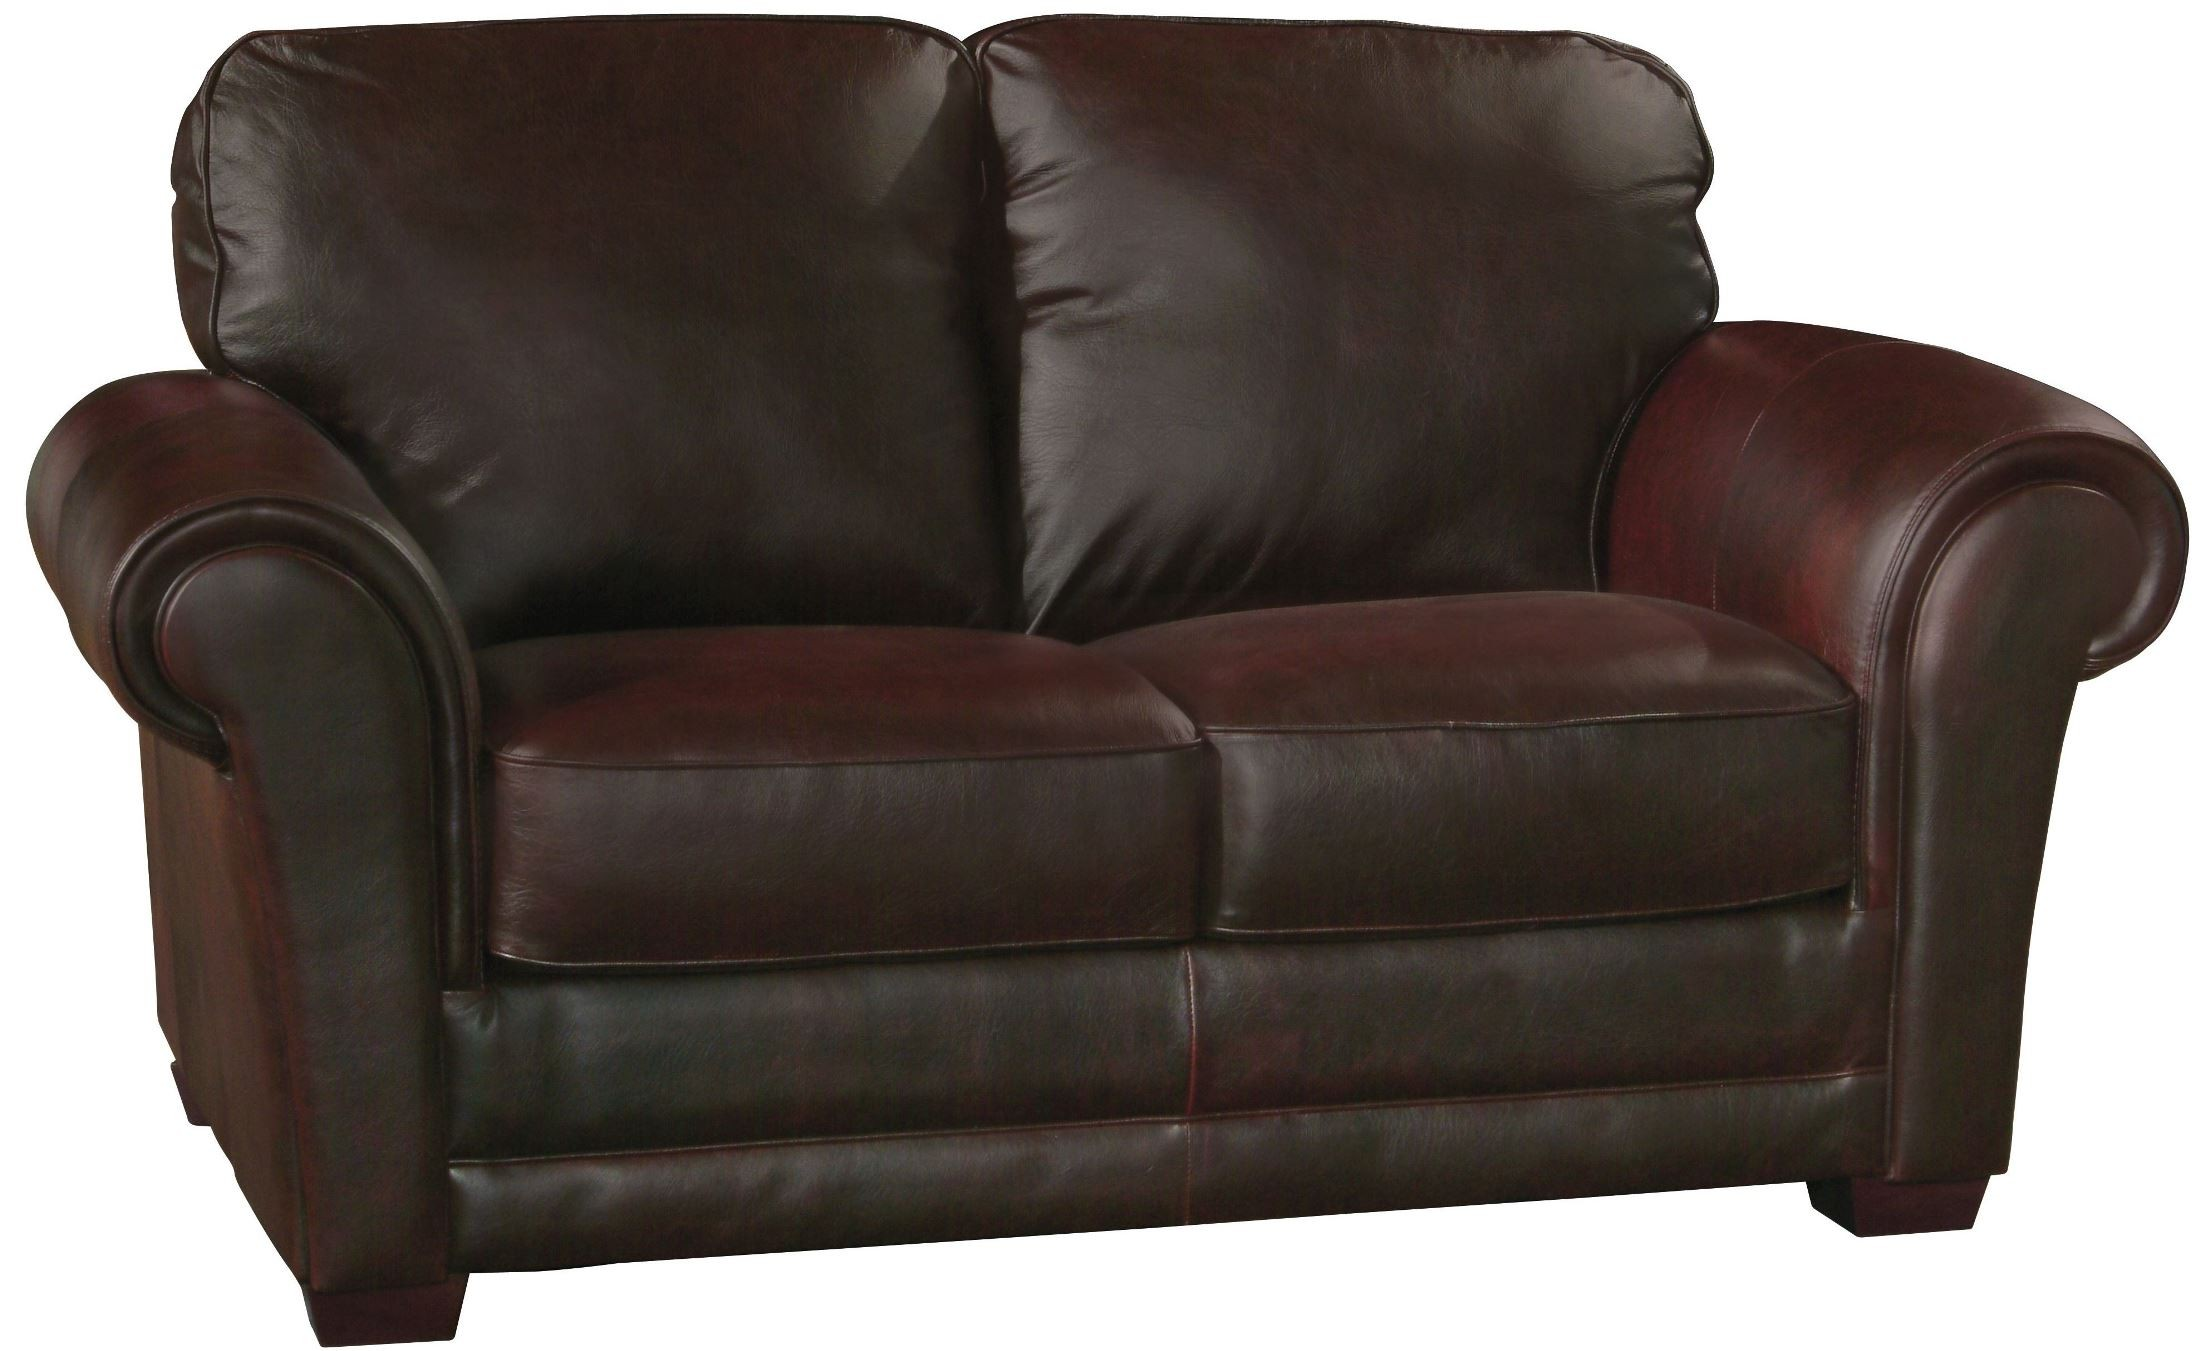 mark whiskey italian leather living room set from luke leather mark coleman furniture. Black Bedroom Furniture Sets. Home Design Ideas